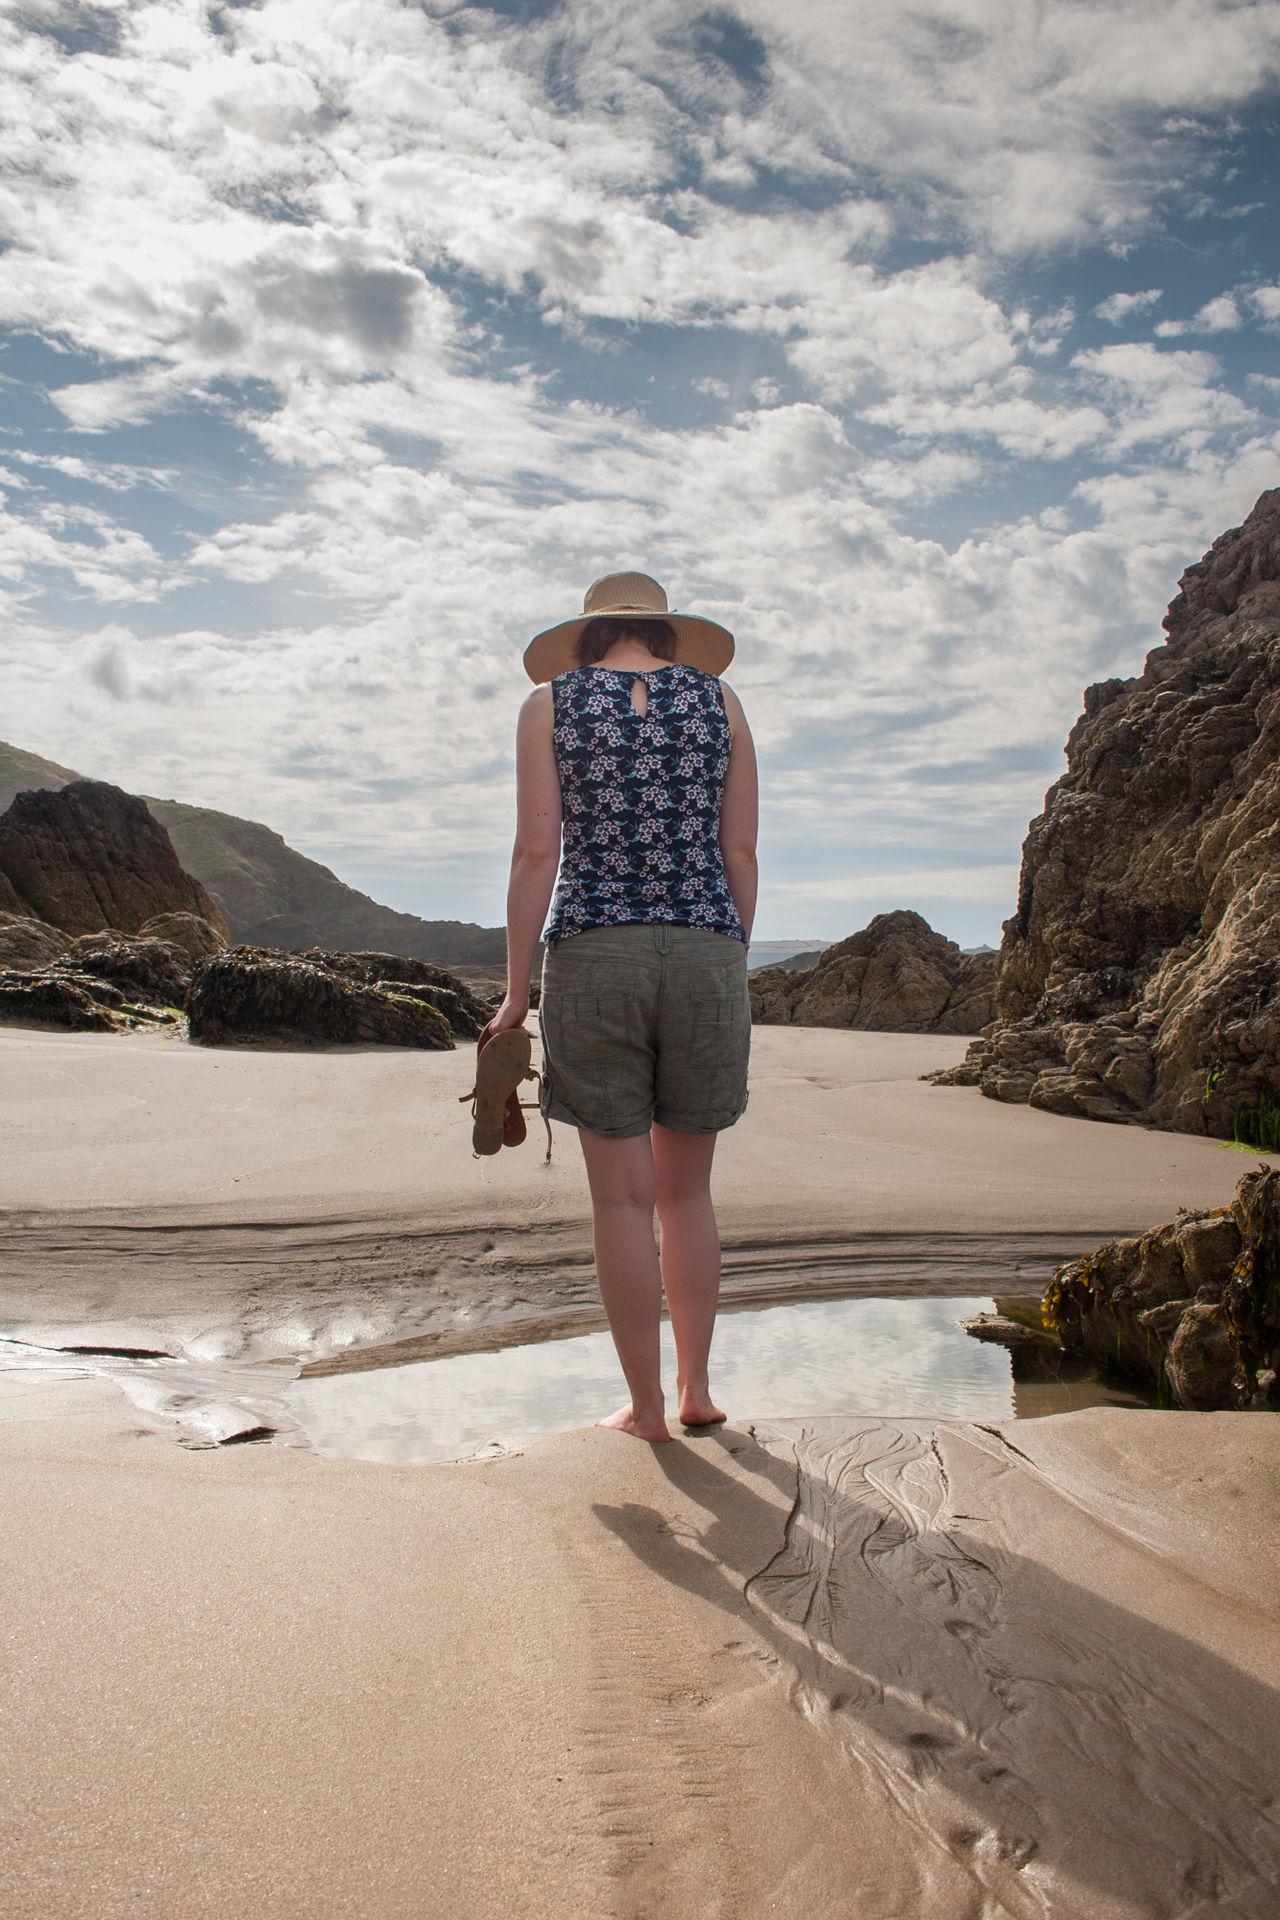 Beautiful stock photos of urlaub, 25-29 Years, Beach, Casual Clothing, Cloud - Sky